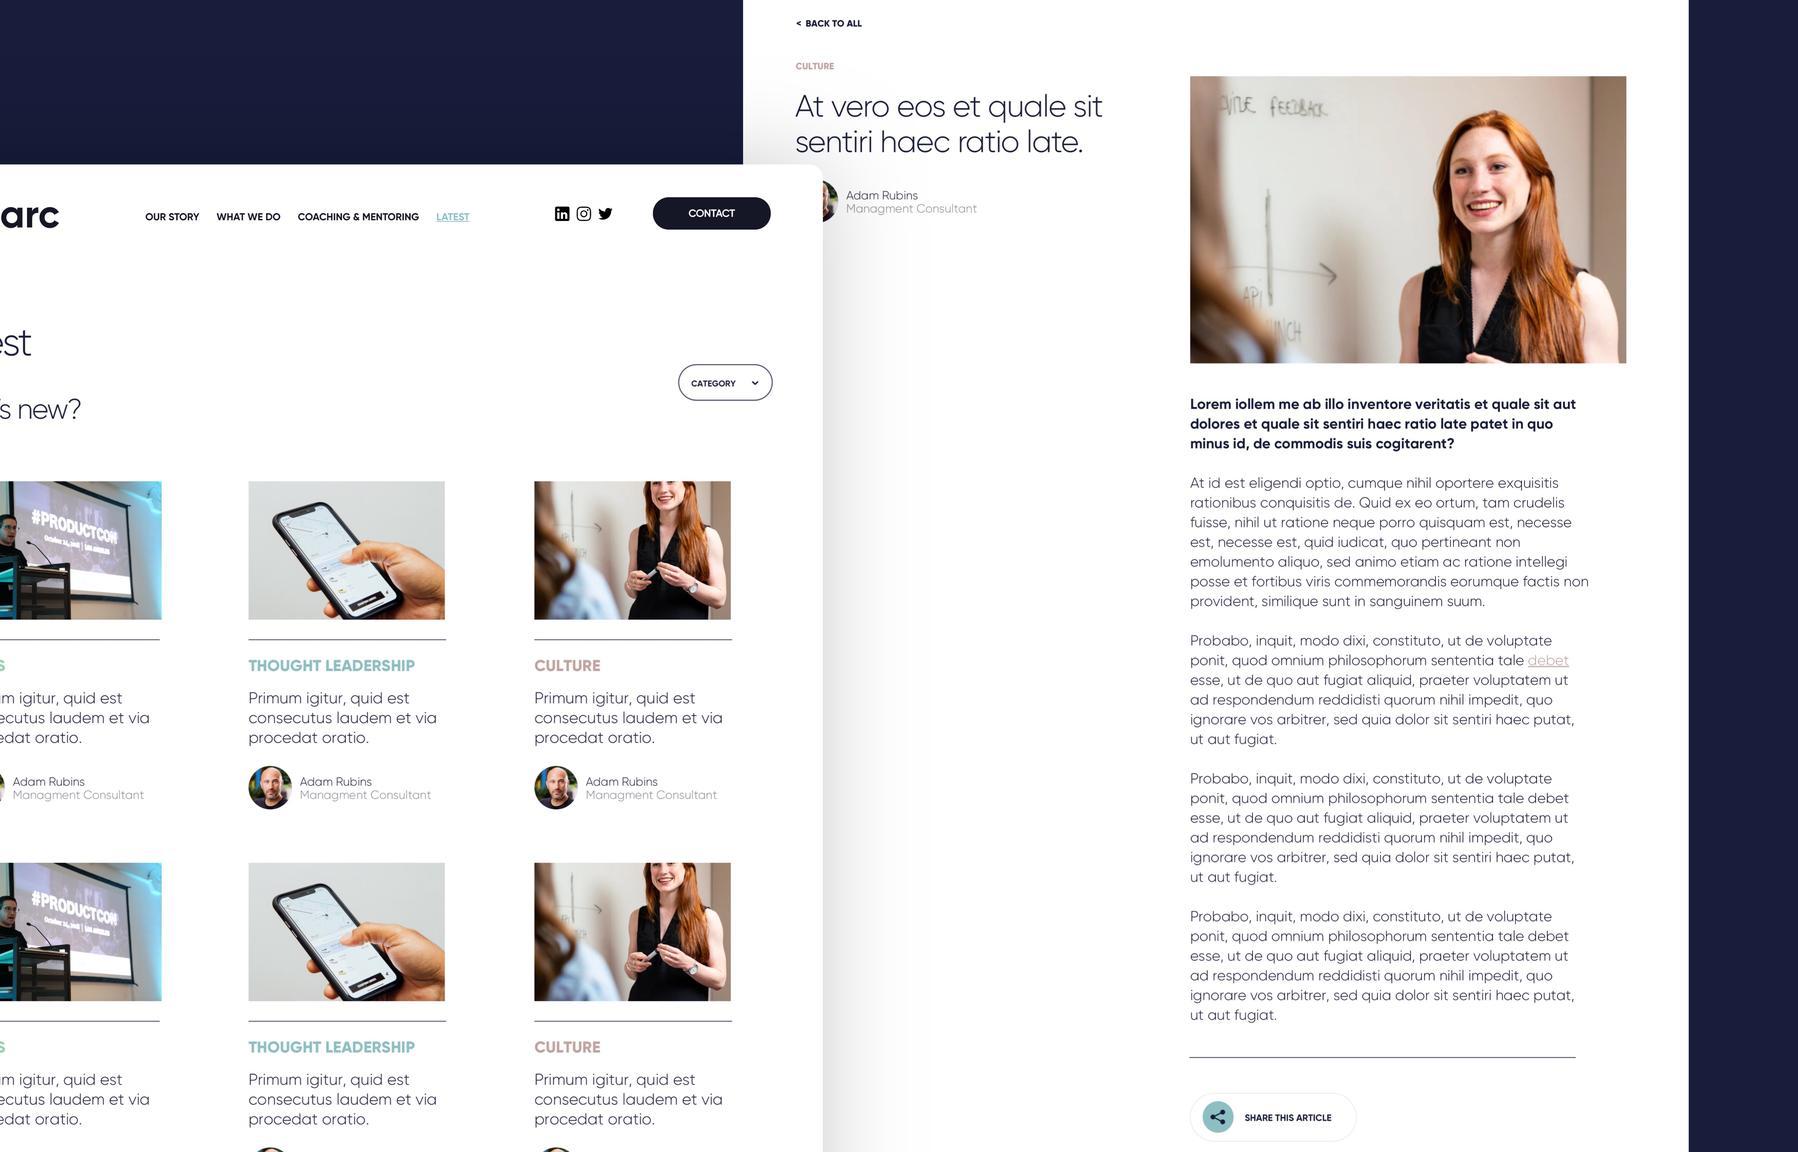 The Arc | Making Websites Better